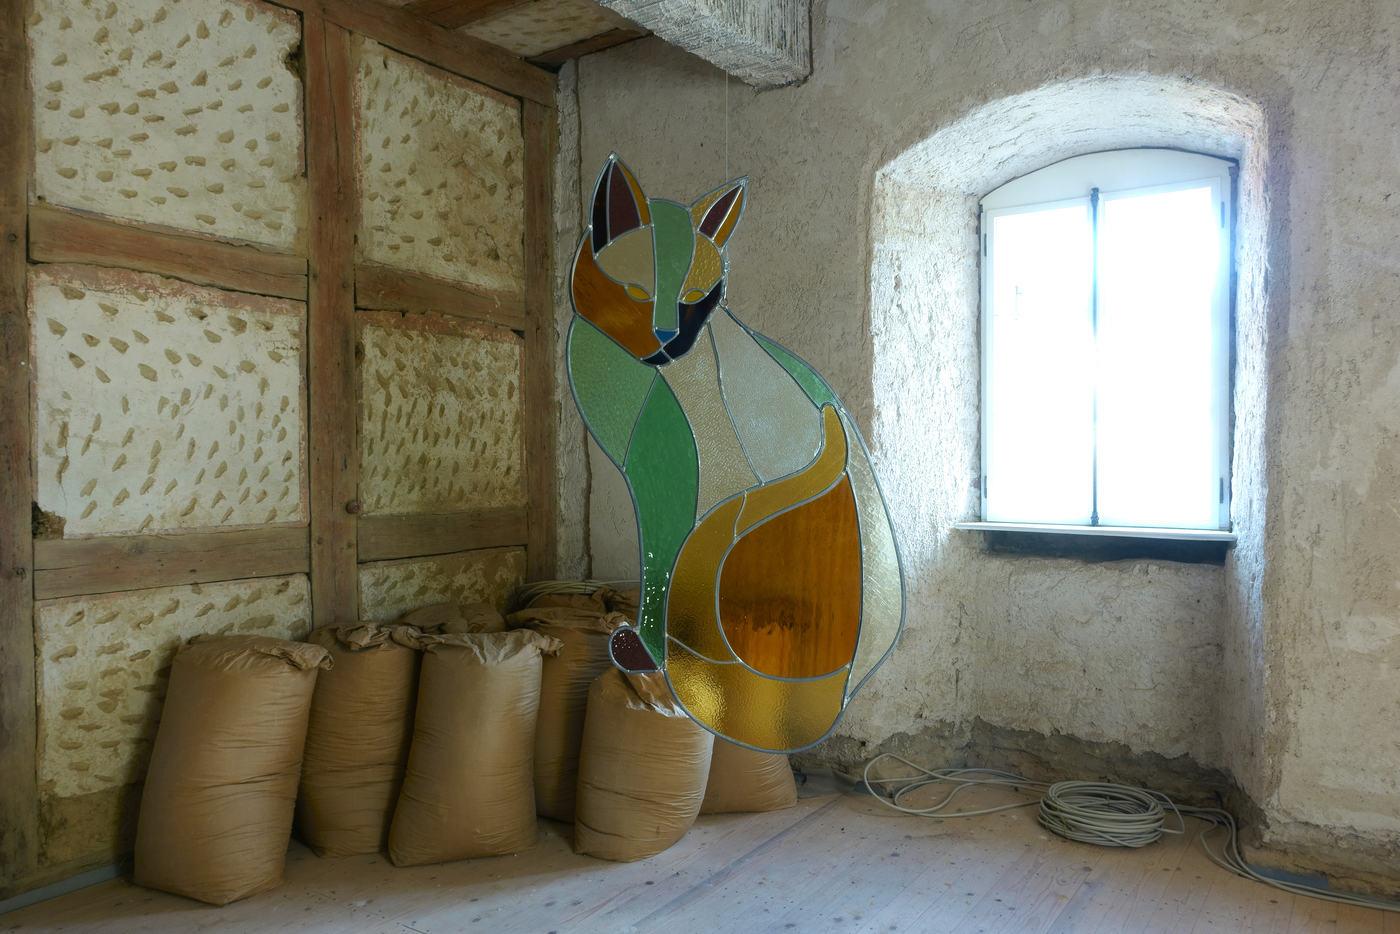 Kunstverein Wiesen_KuWi_Forward to History_Jan Kiefer & Robert Brambora_2016_JK_Room2_b